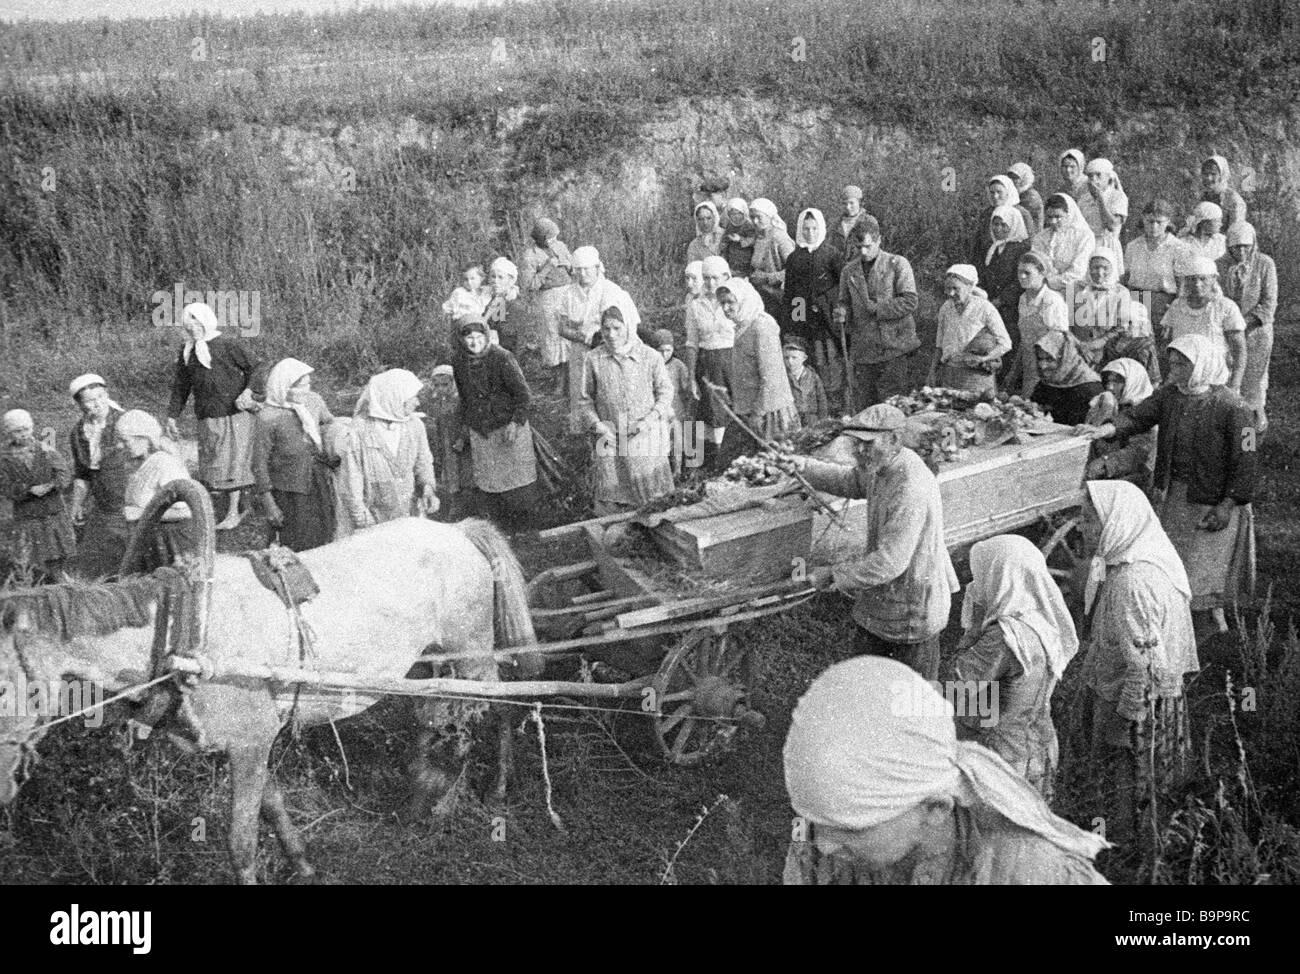 Vargov villagers bury their relatives killed by Nazis - Stock Image